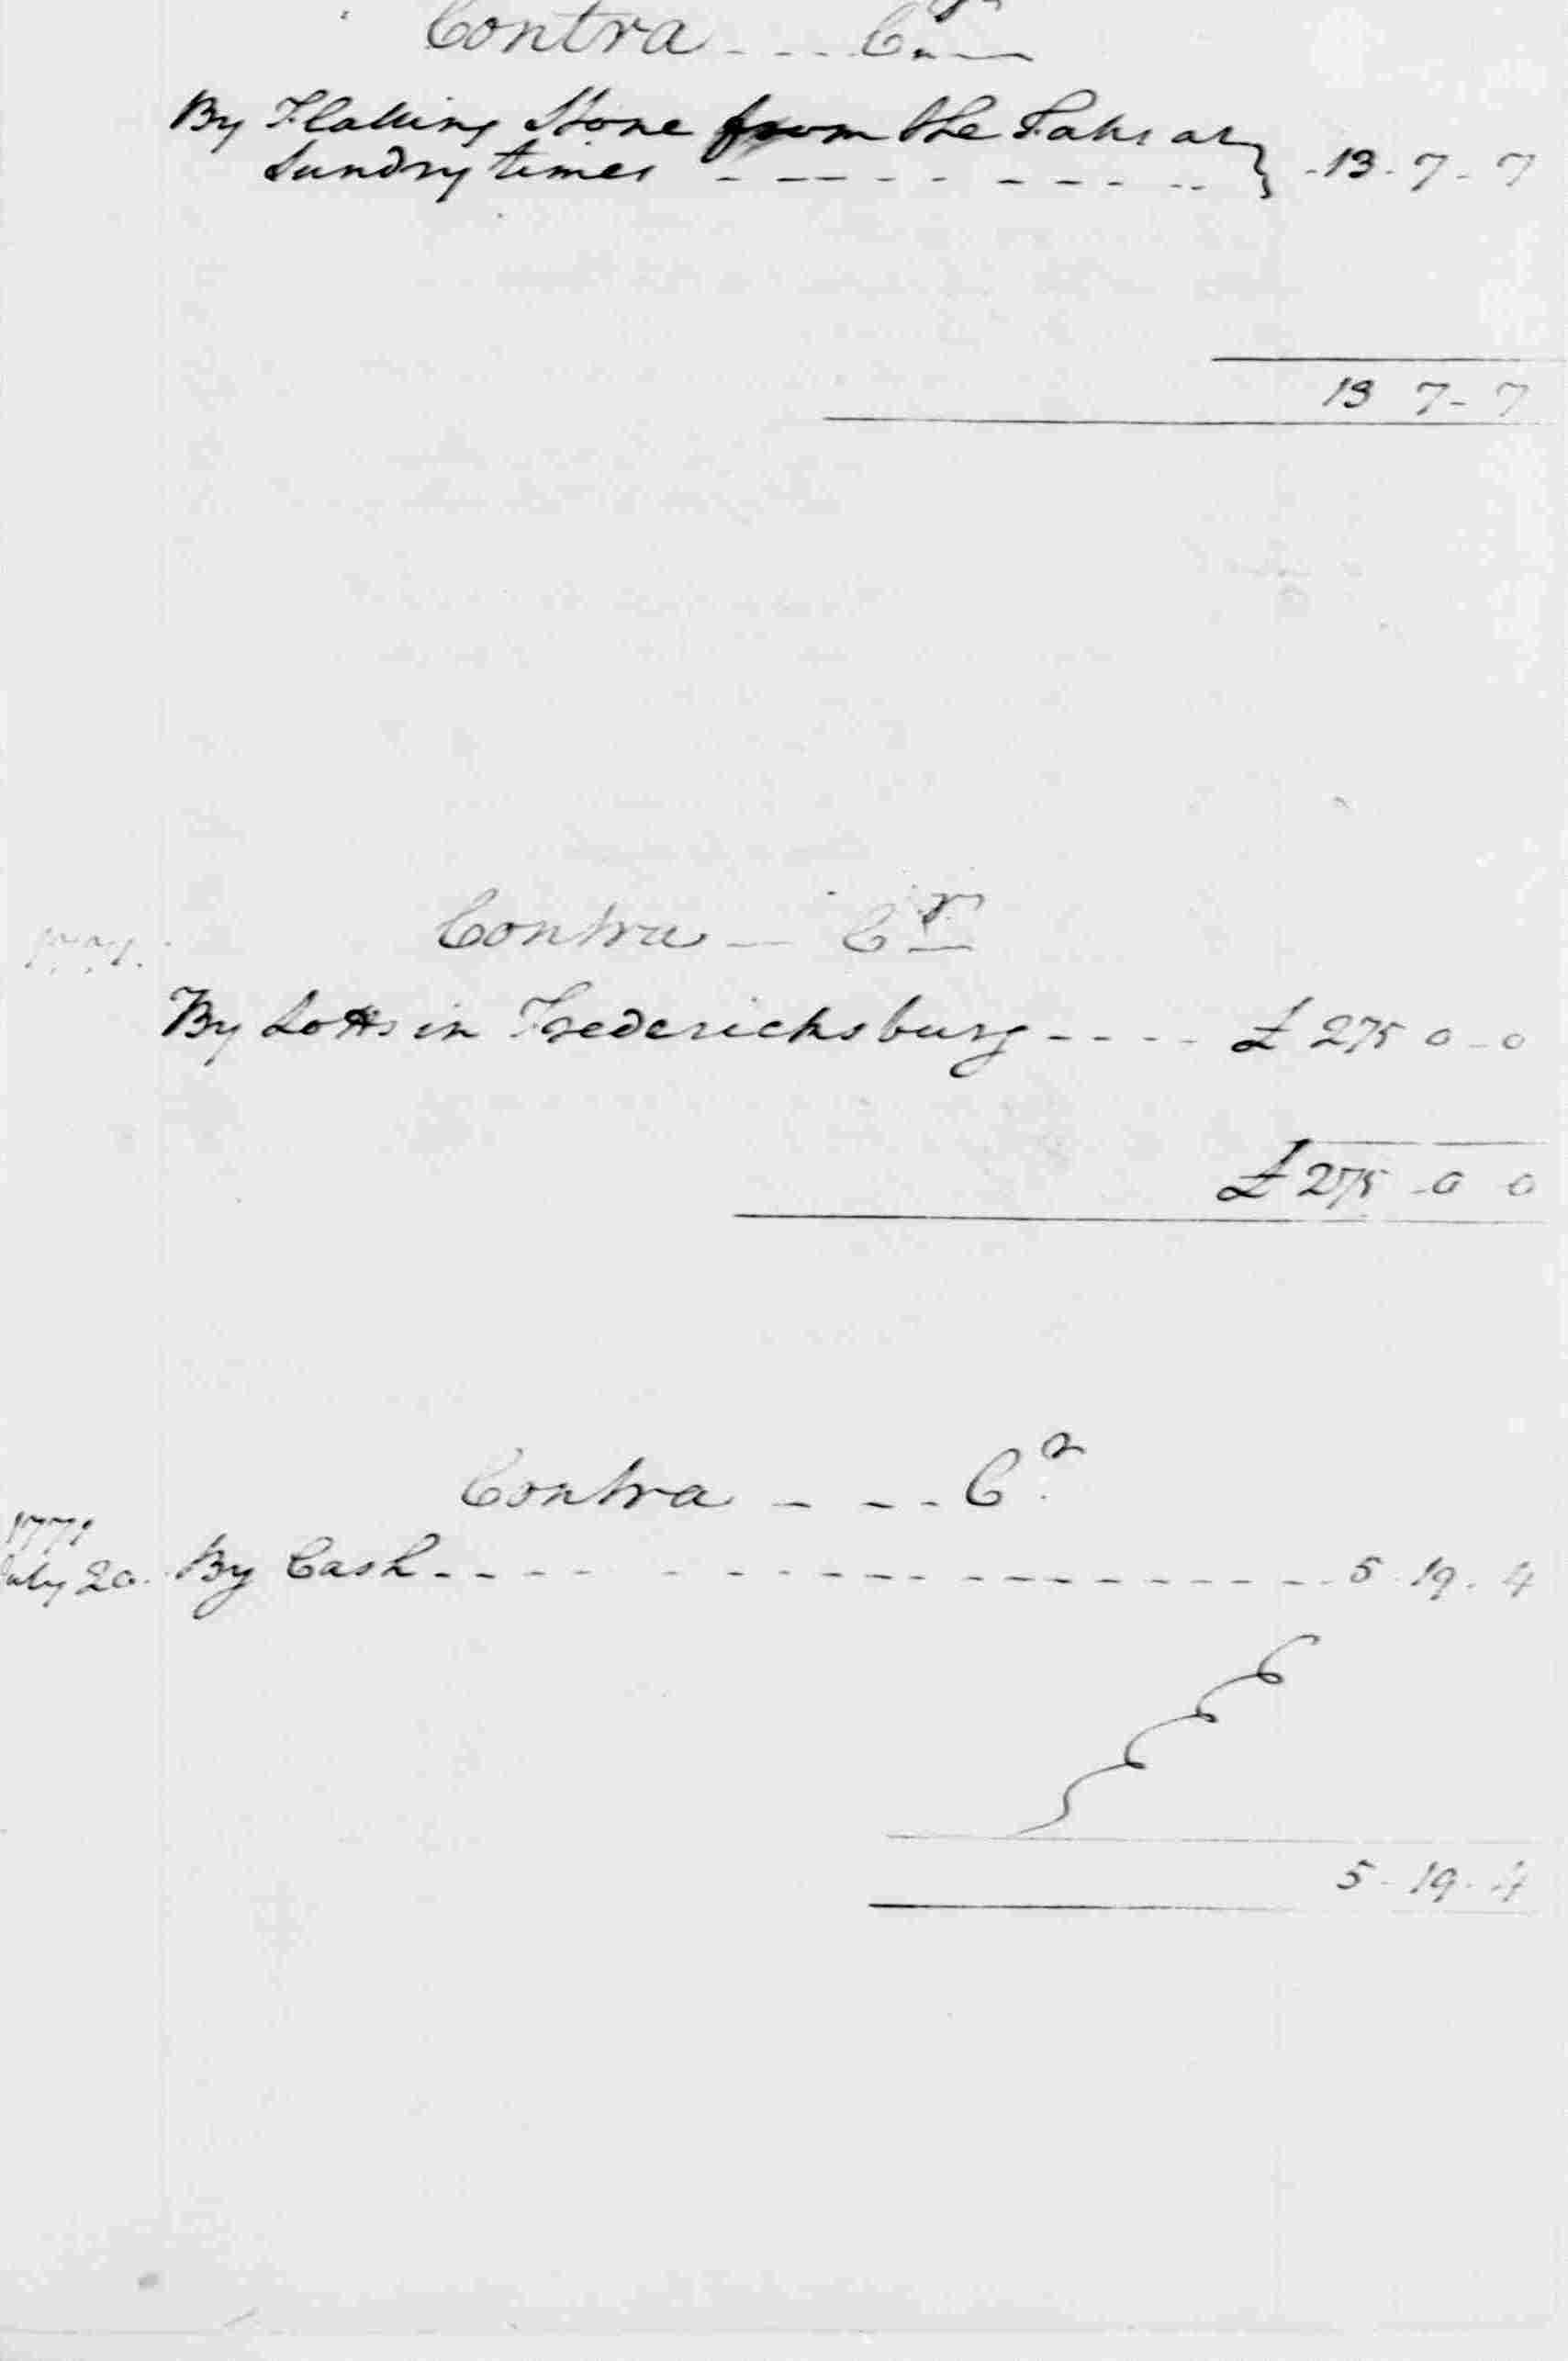 Ledger A, folio 336, right side